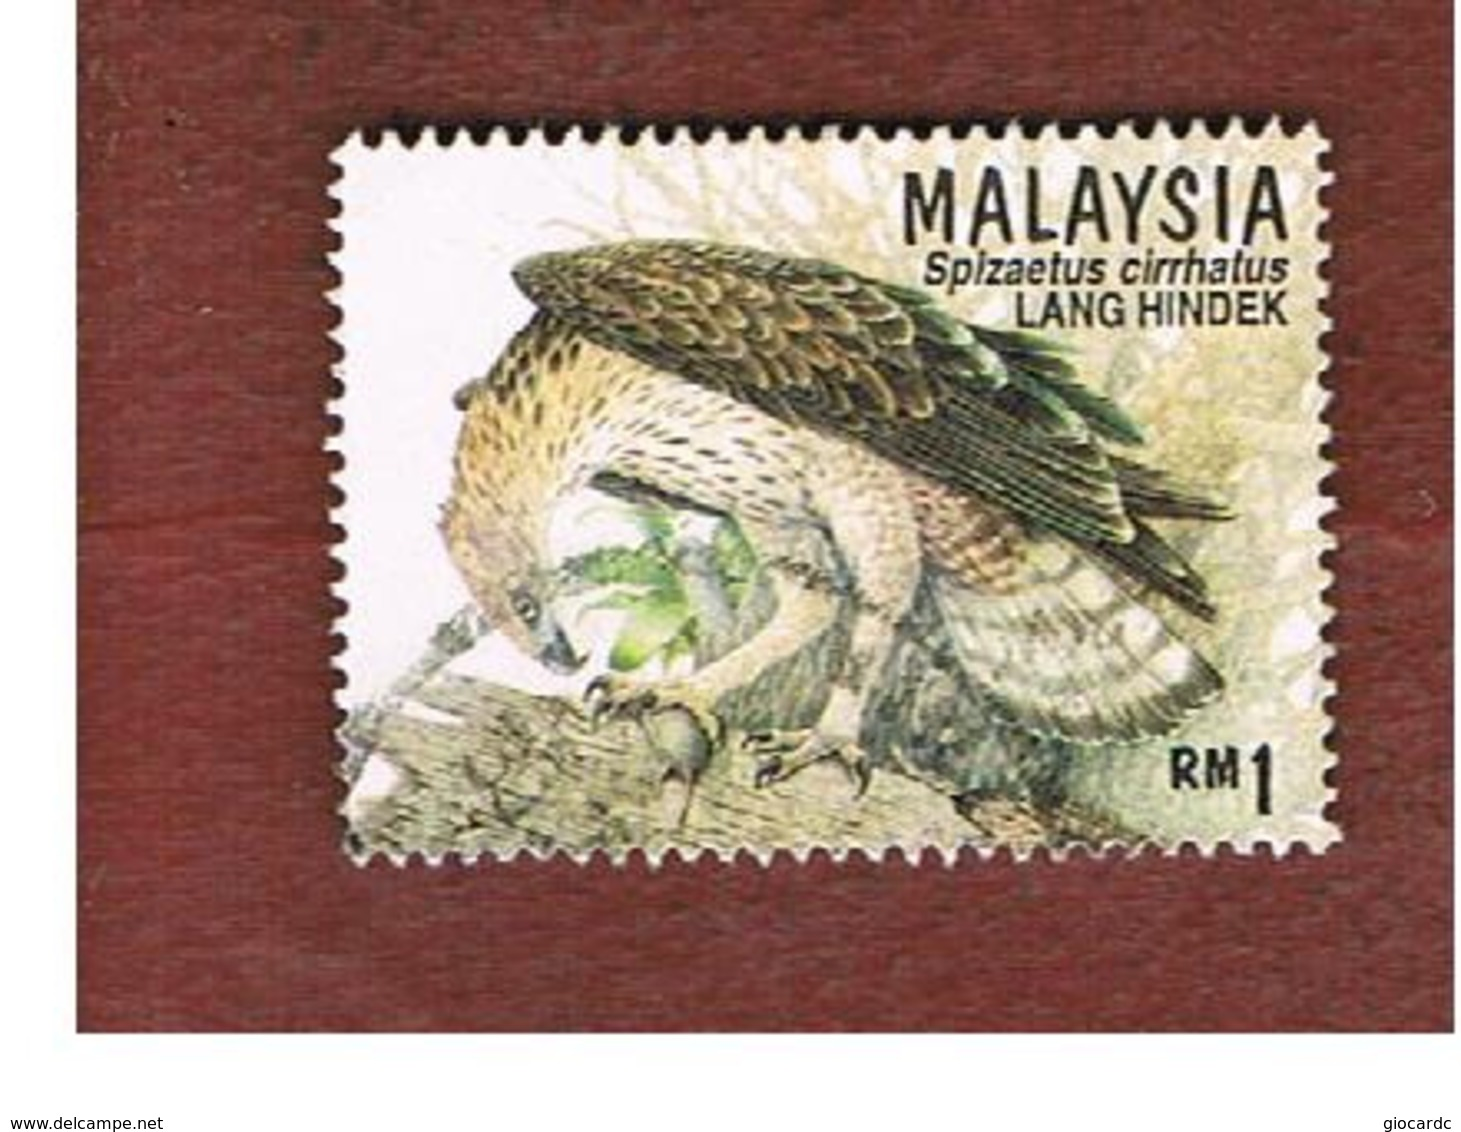 MALESIA (MALAYSIA)  -  SG 606  -   1996 BIRDS OF PREY: CRESTED HAWK EAGLE  -  USED ° - Malesia (1964-...)